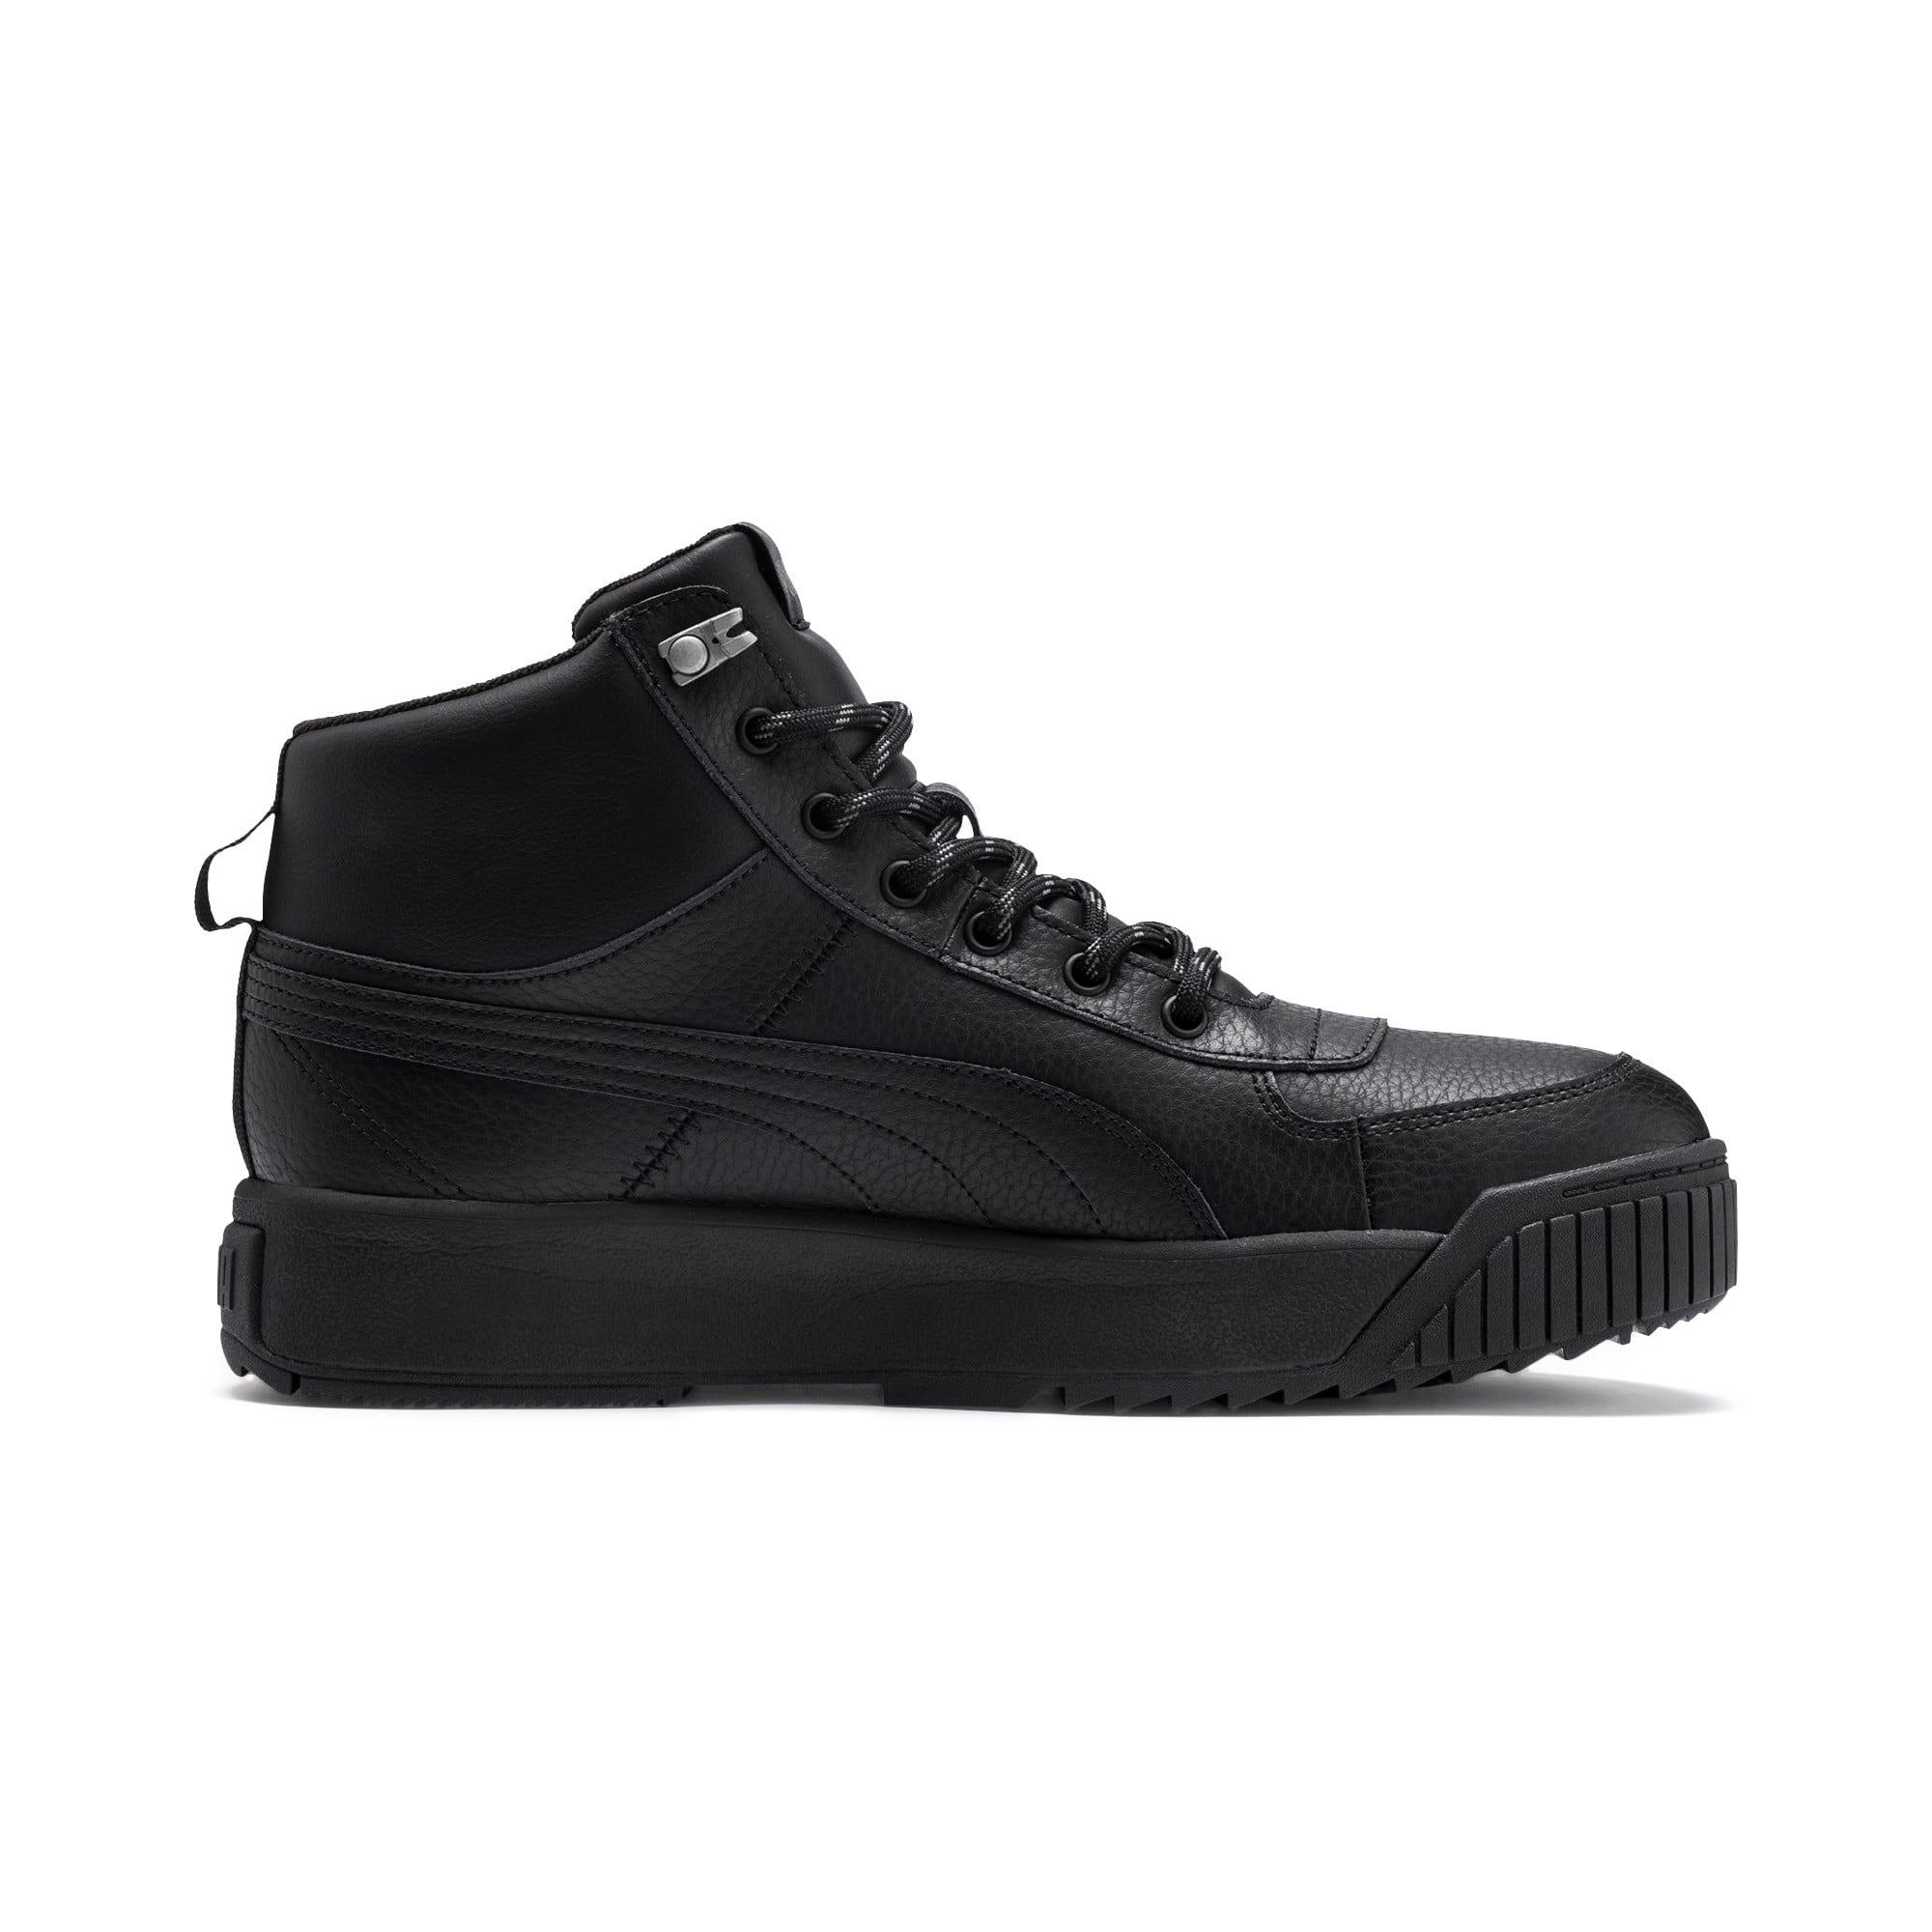 Thumbnail 6 of Tarrenz SB PURETEX Mid Sneakers, Puma Black-Puma Black, medium